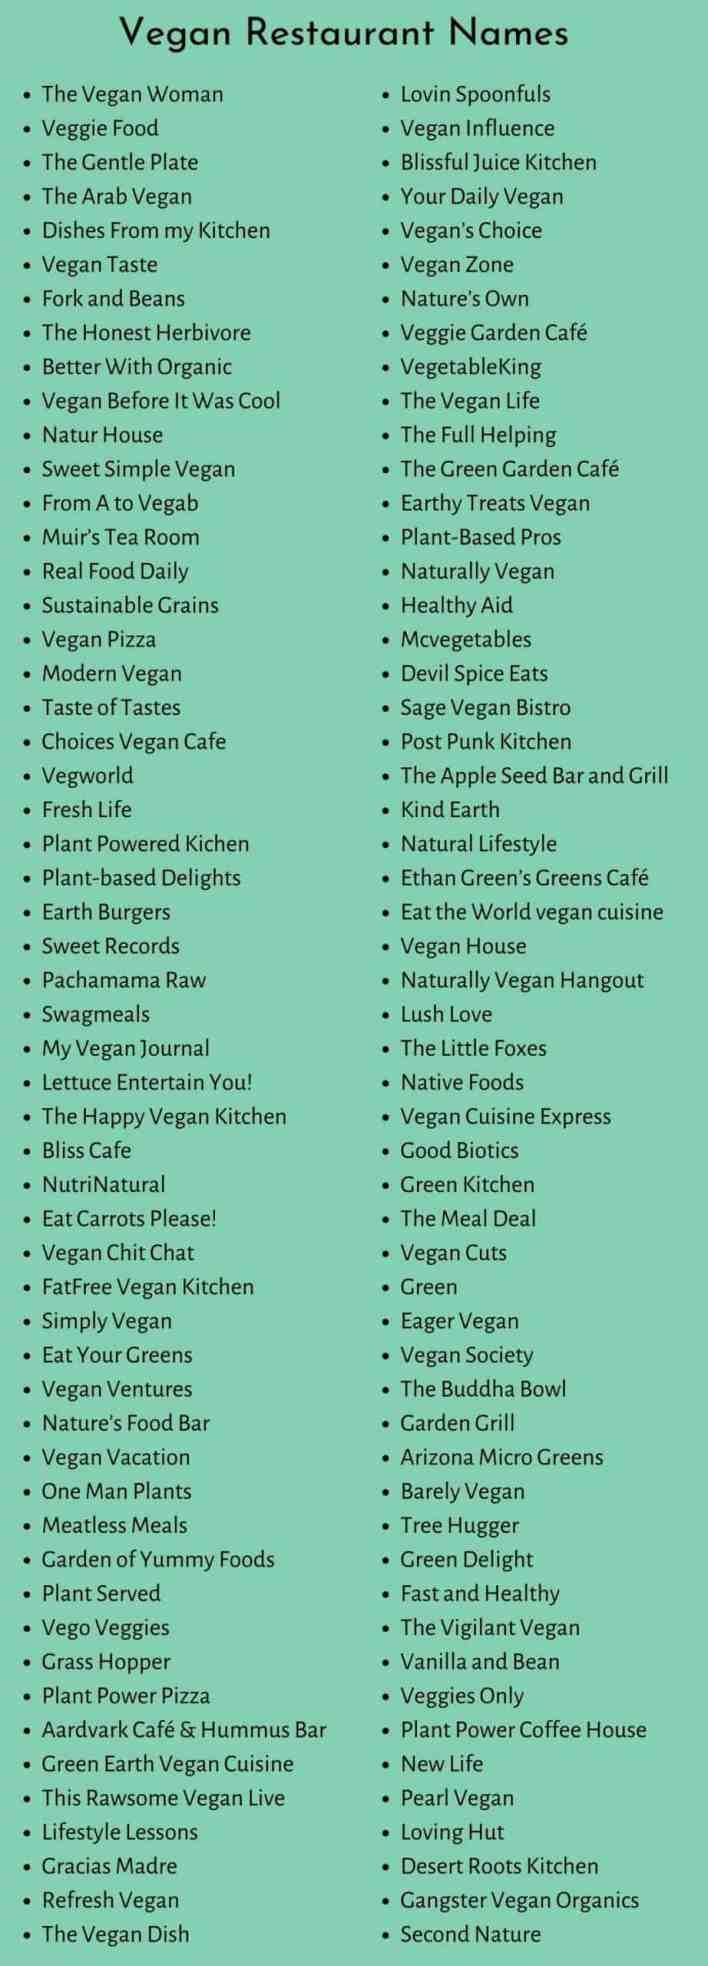 Vegan Restaurant Names